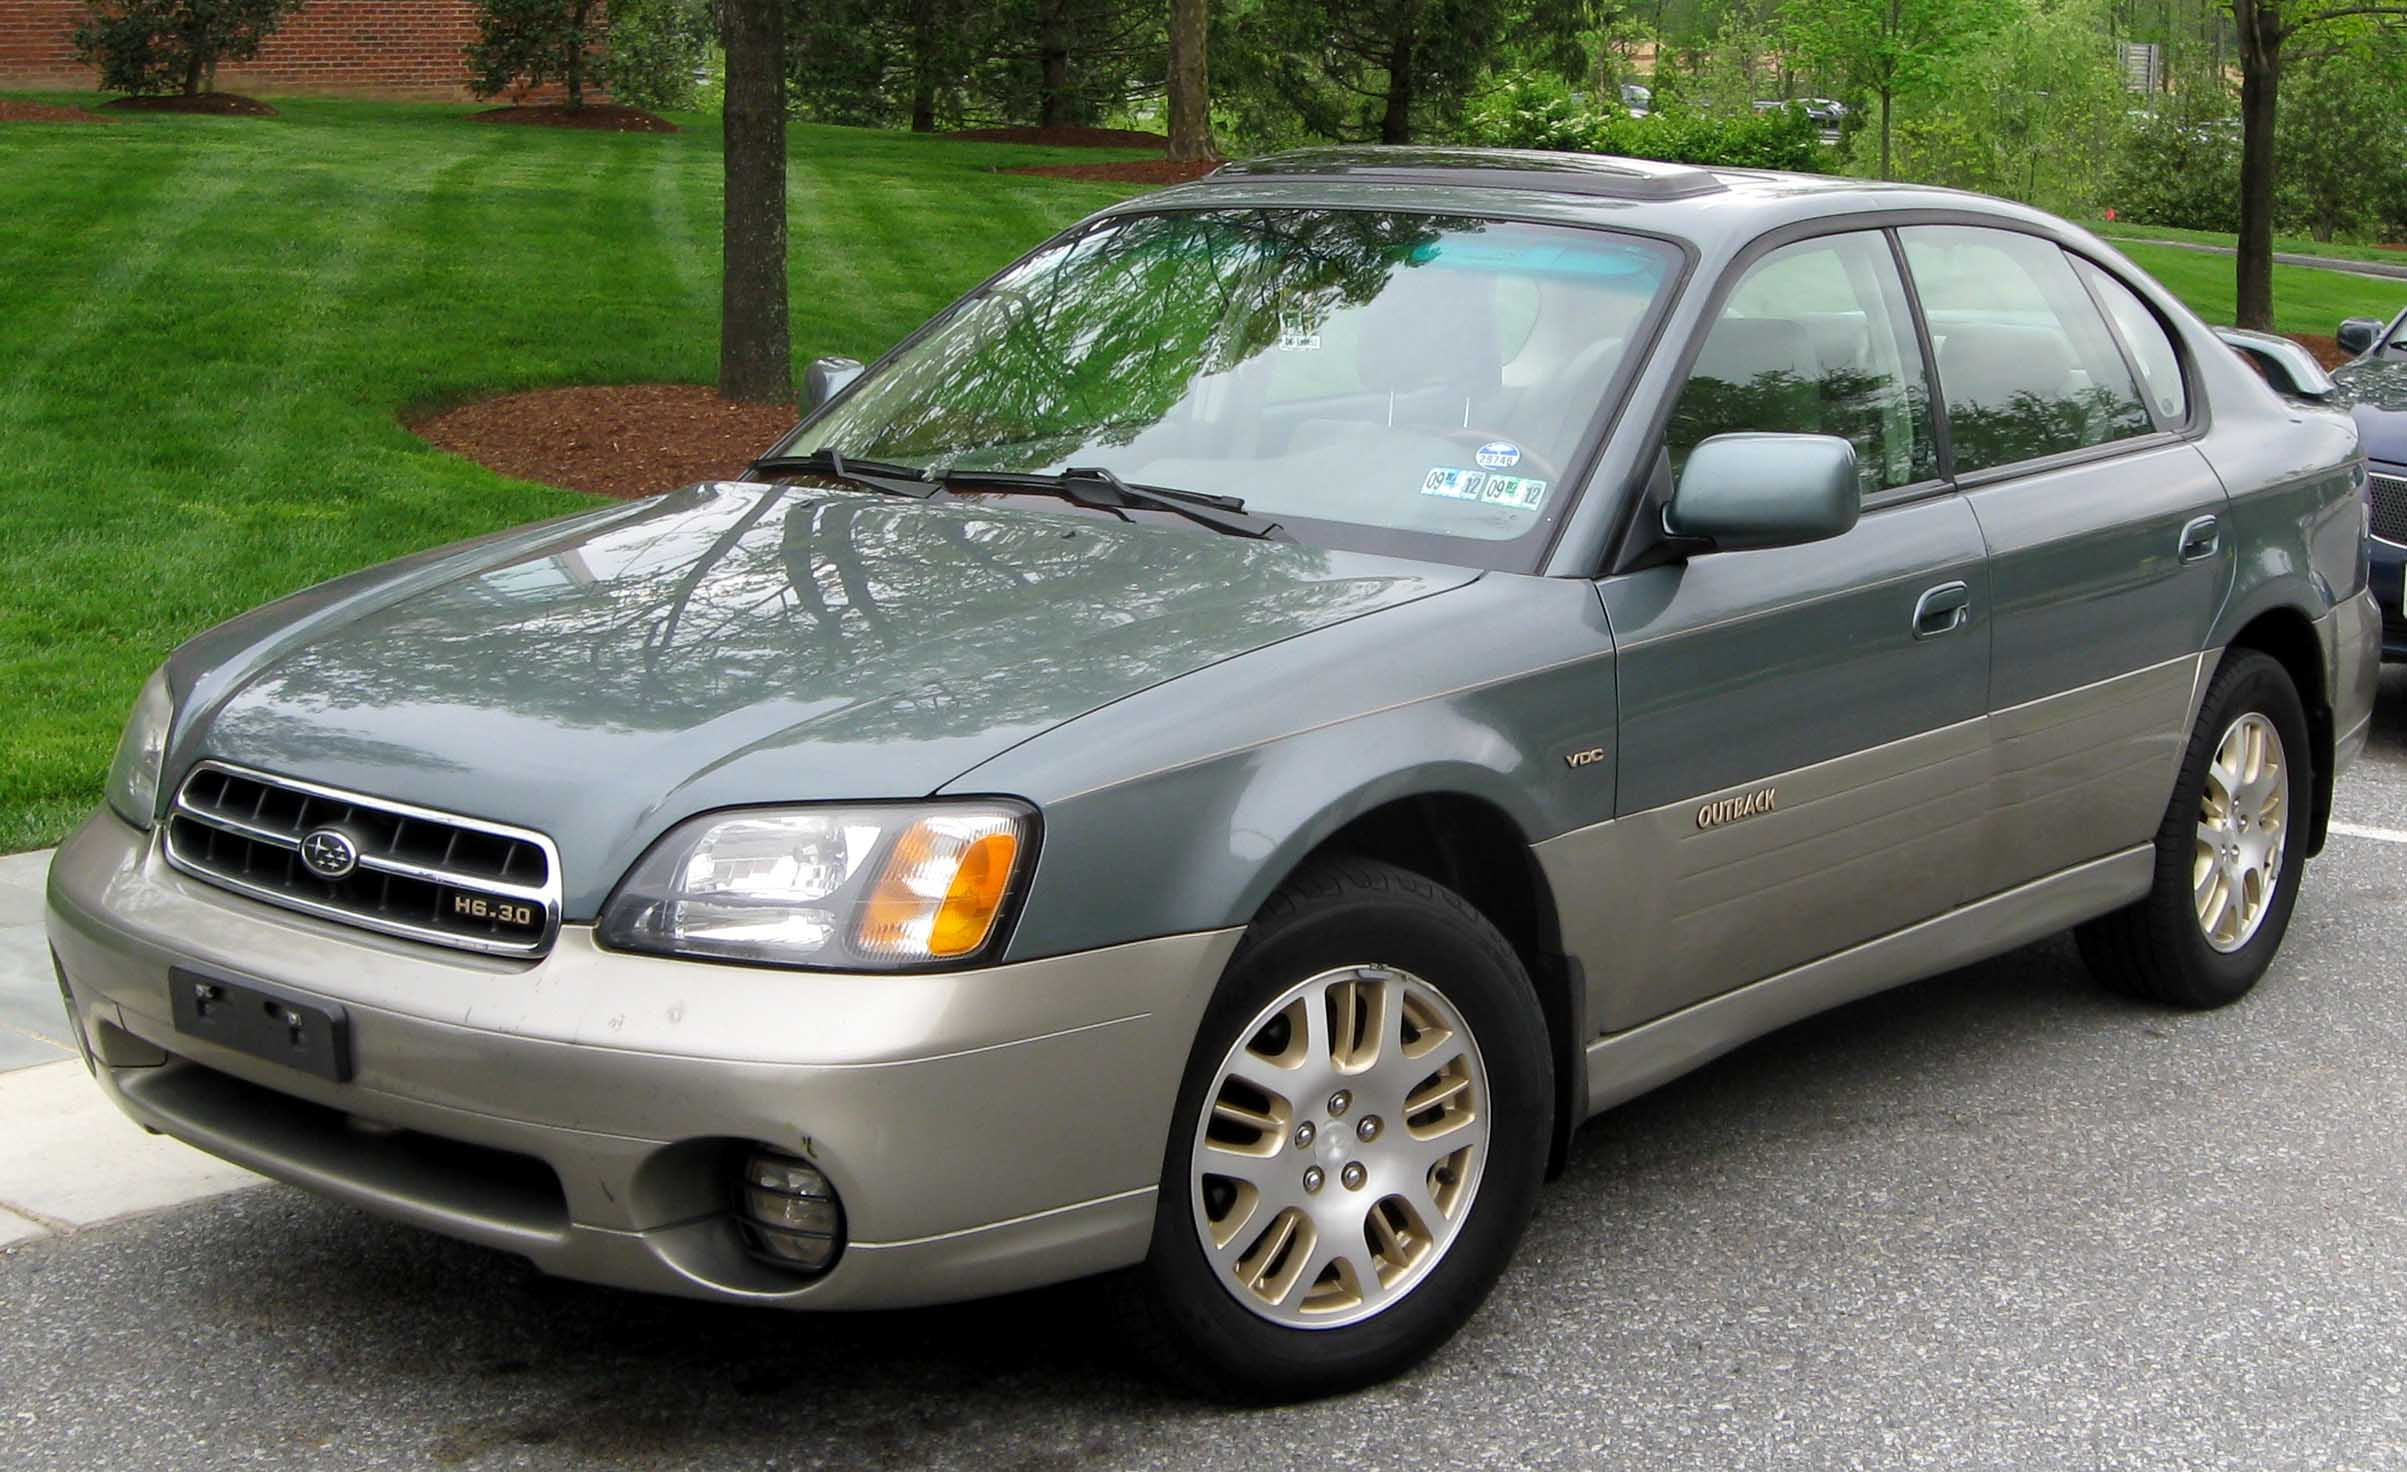 Subaru Legacy Lifted >> File:2nd Subaru Outback sedan.jpg - Wikimedia Commons